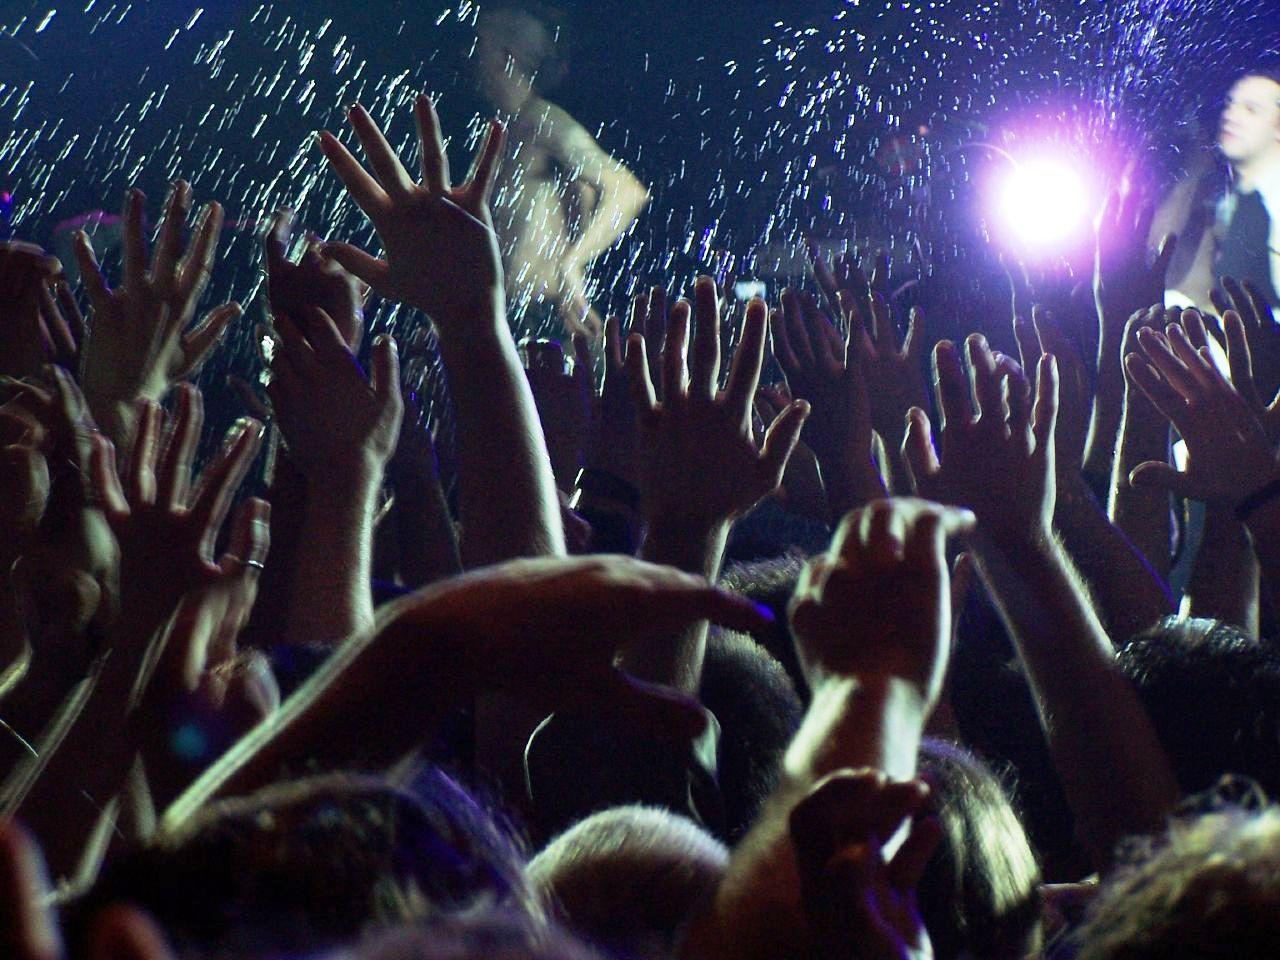 http://upload.wikimedia.org/wikipedia/commons/b/b9/Festival_des_Artefacts_-_crowd.jpg